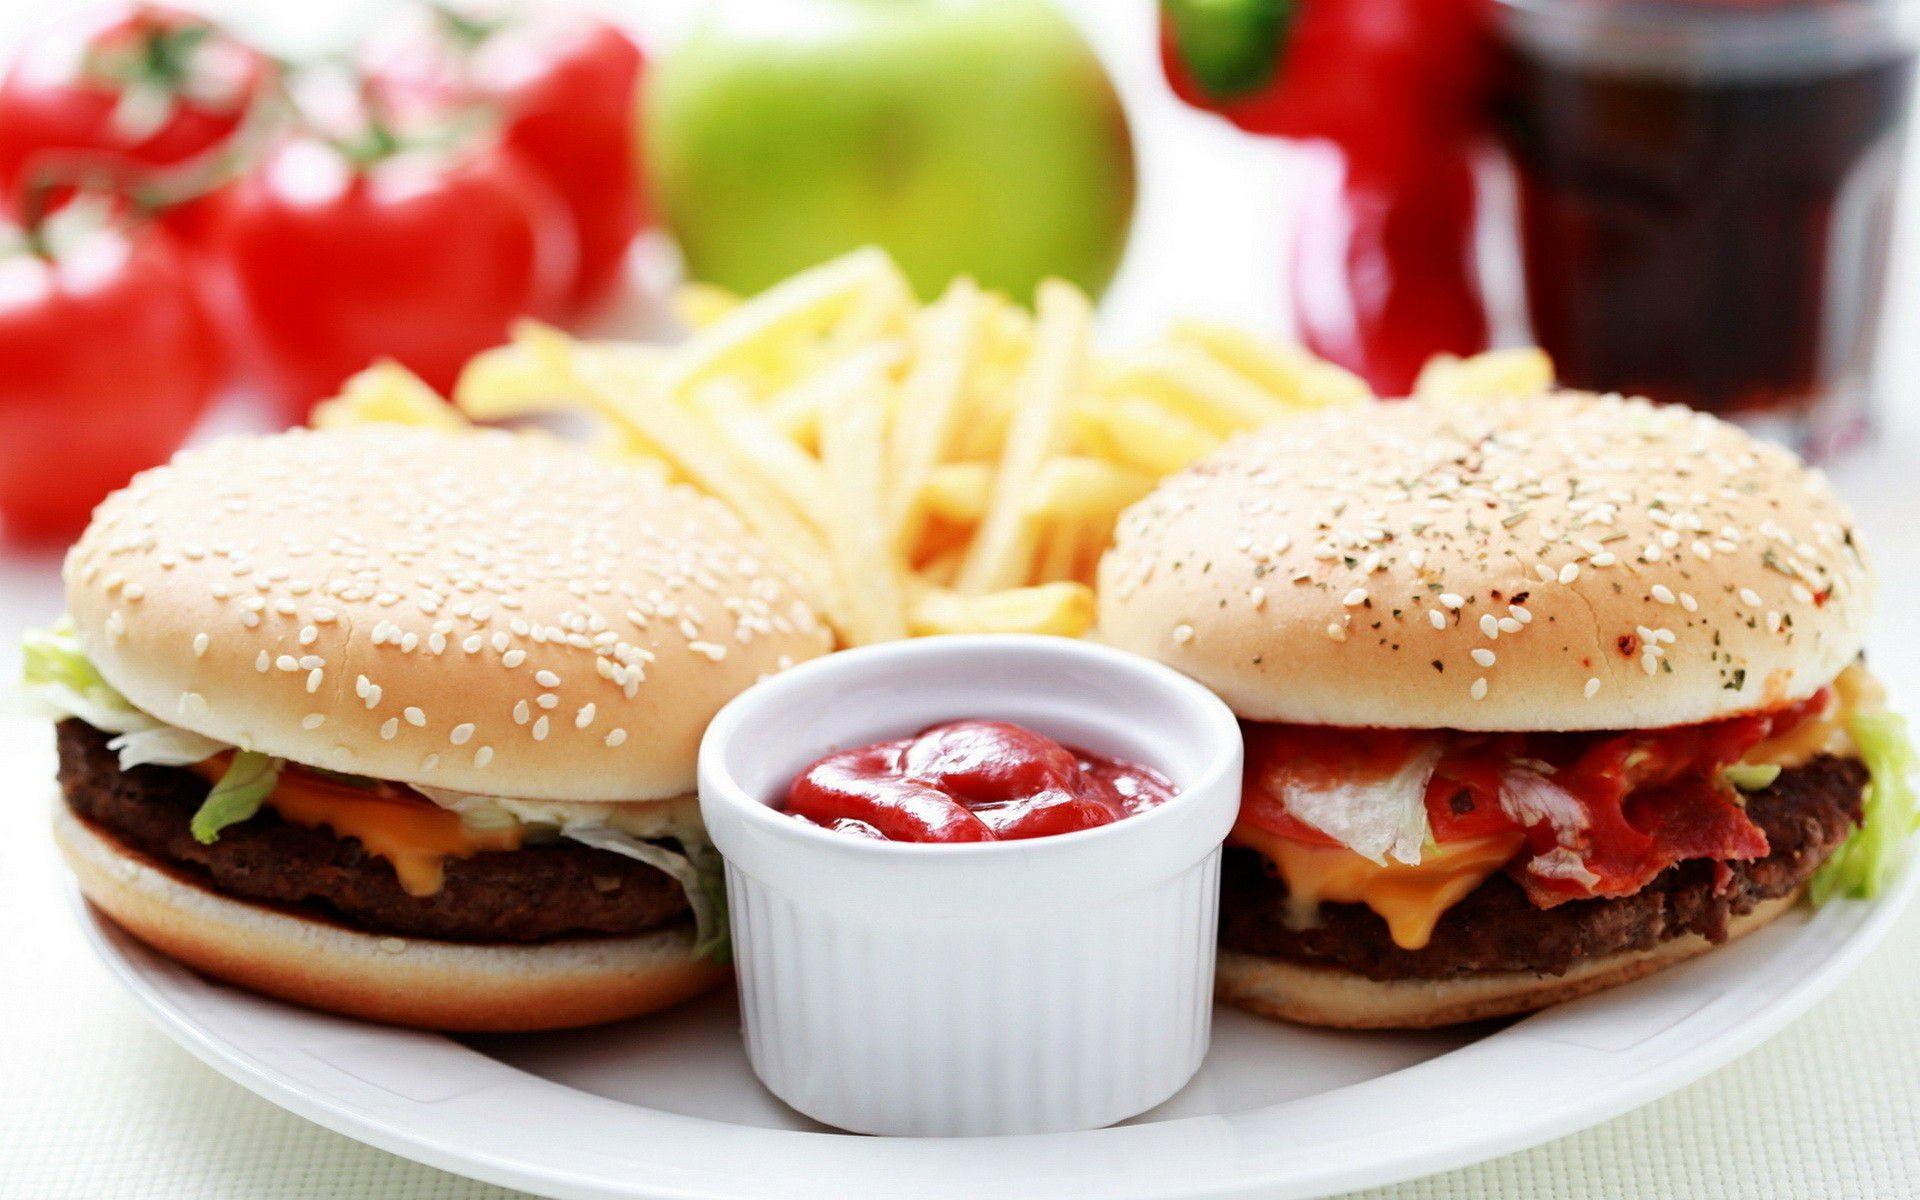 Food background wallpaper